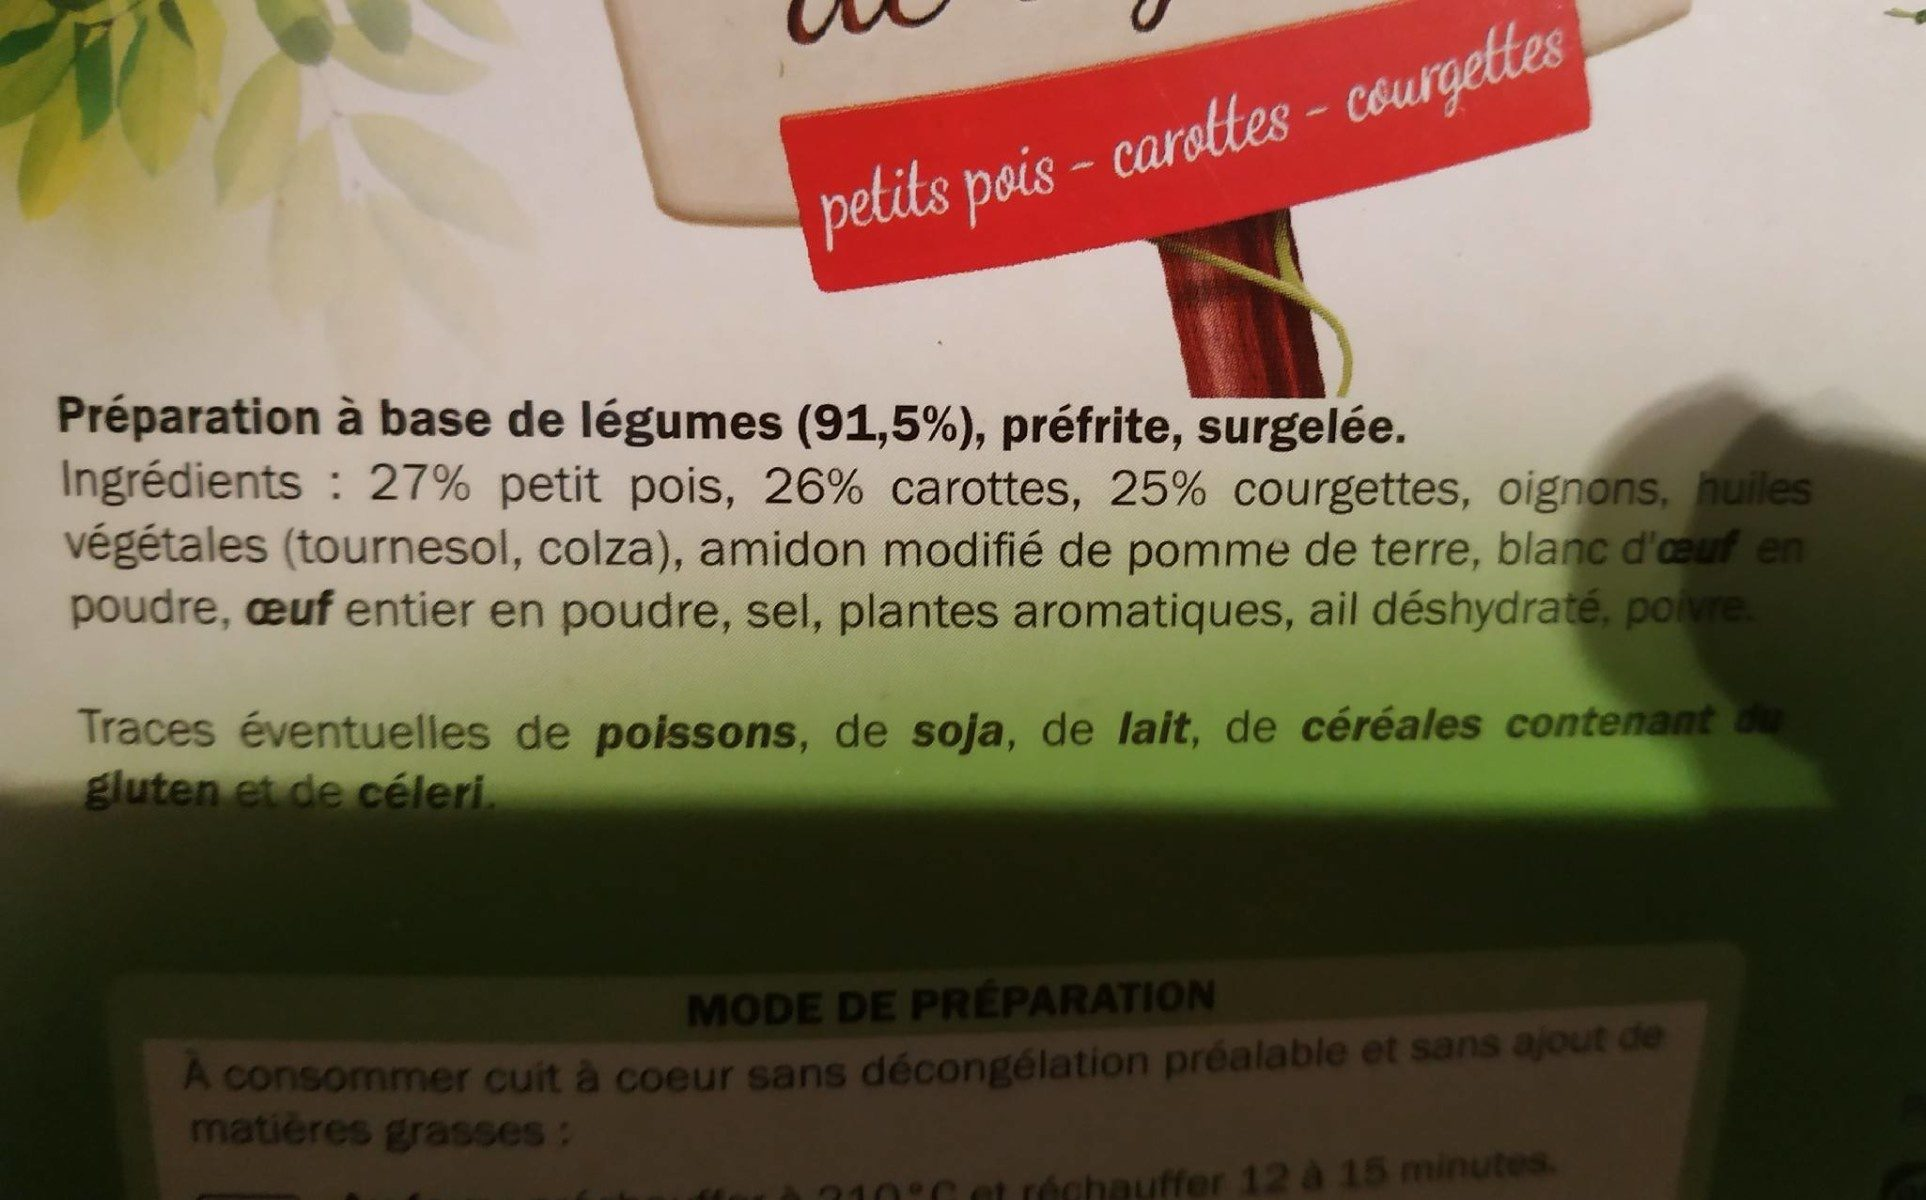 8 palets de légumes - Ingredients - fr